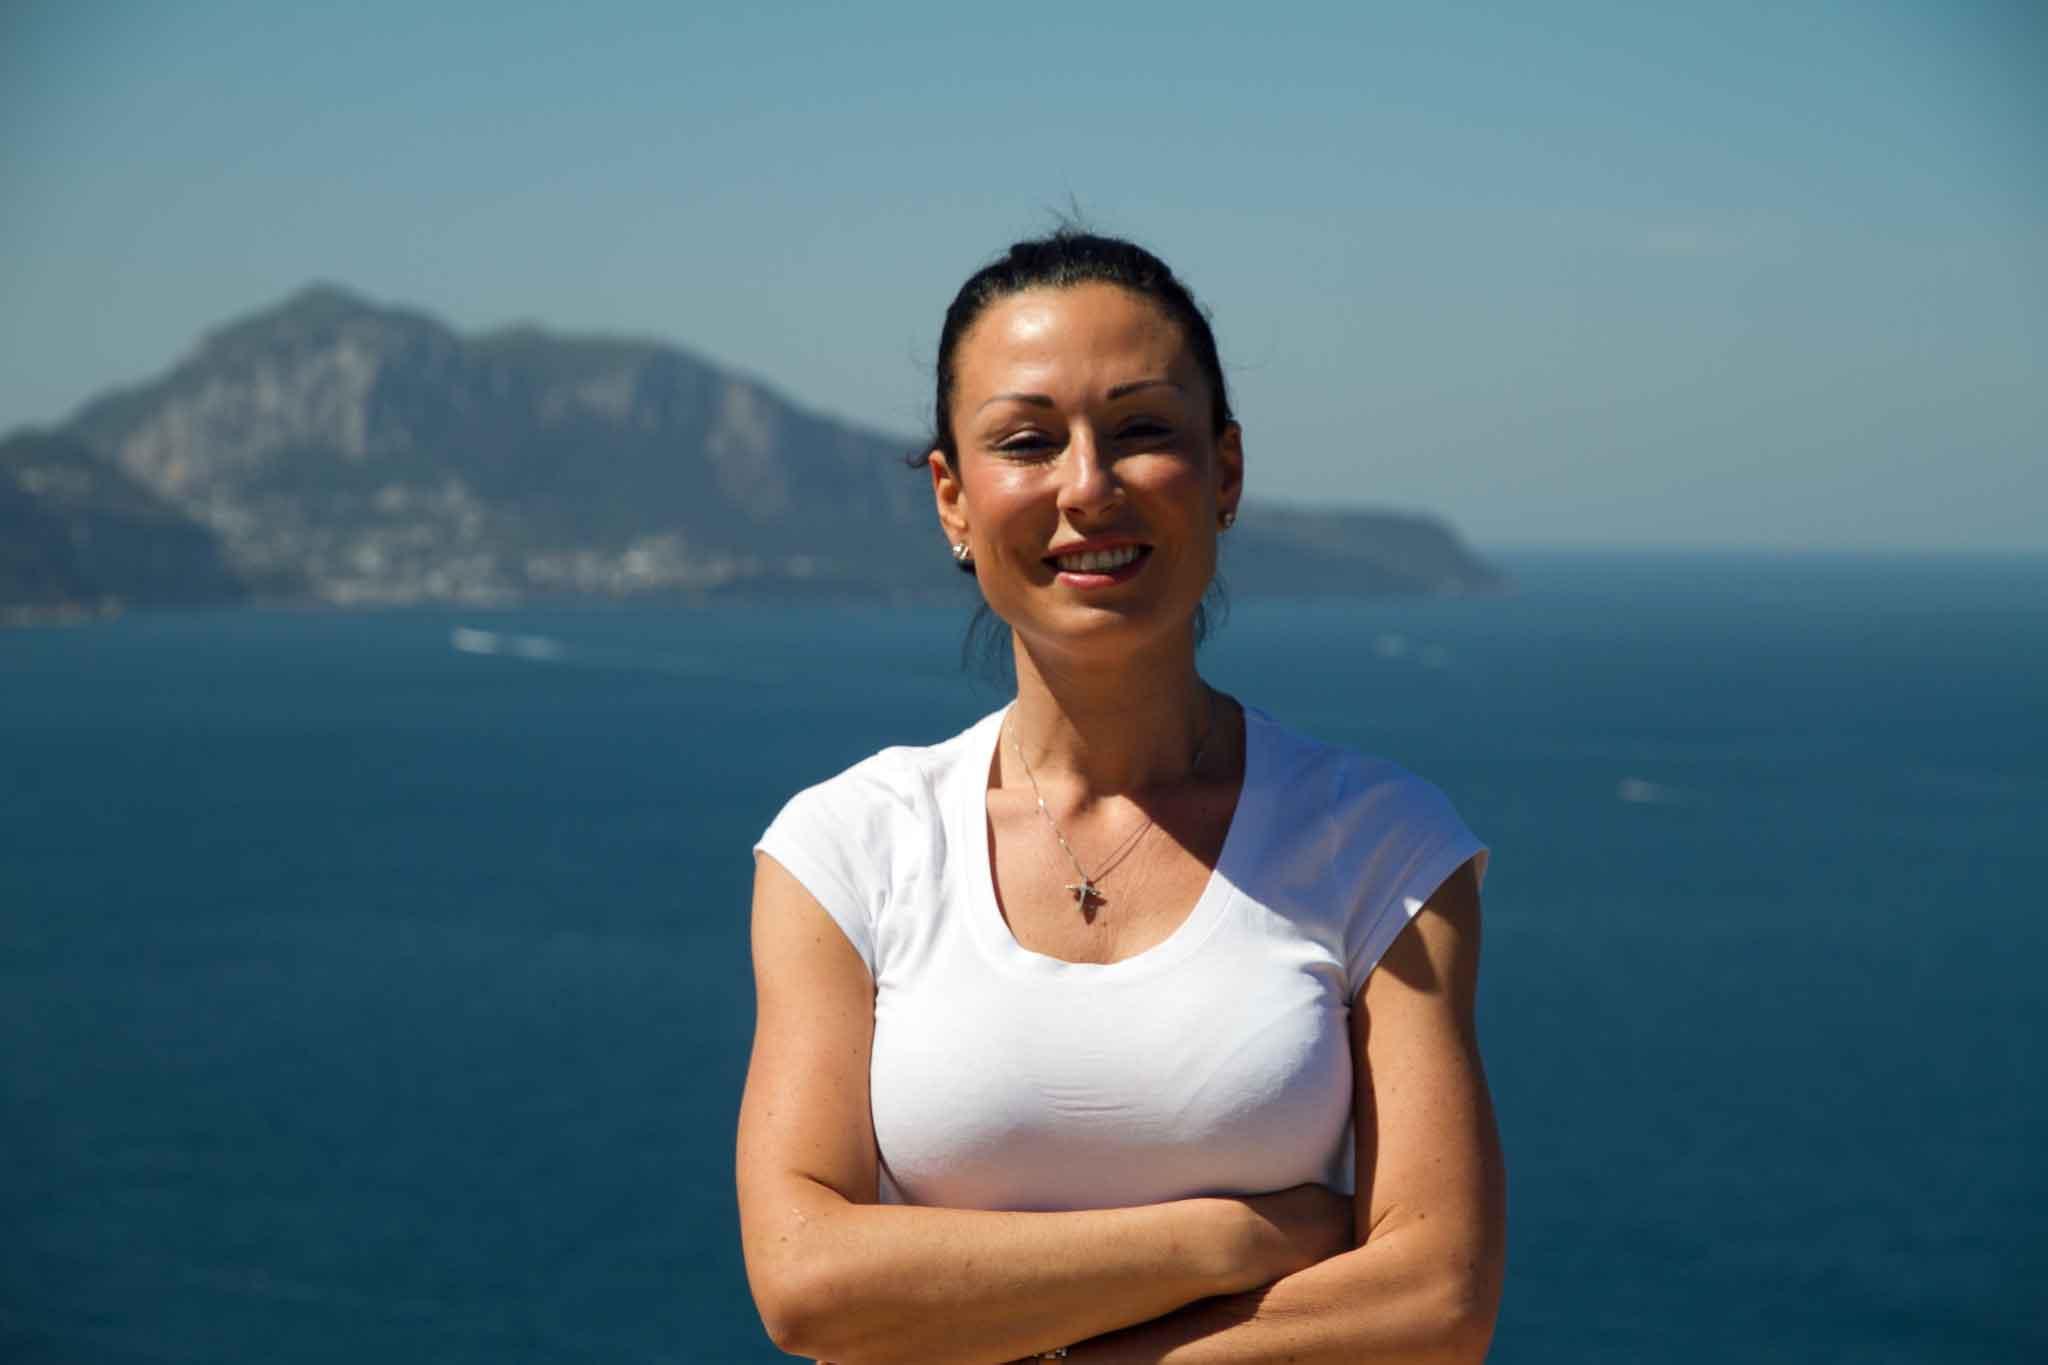 Amelia Mazzola